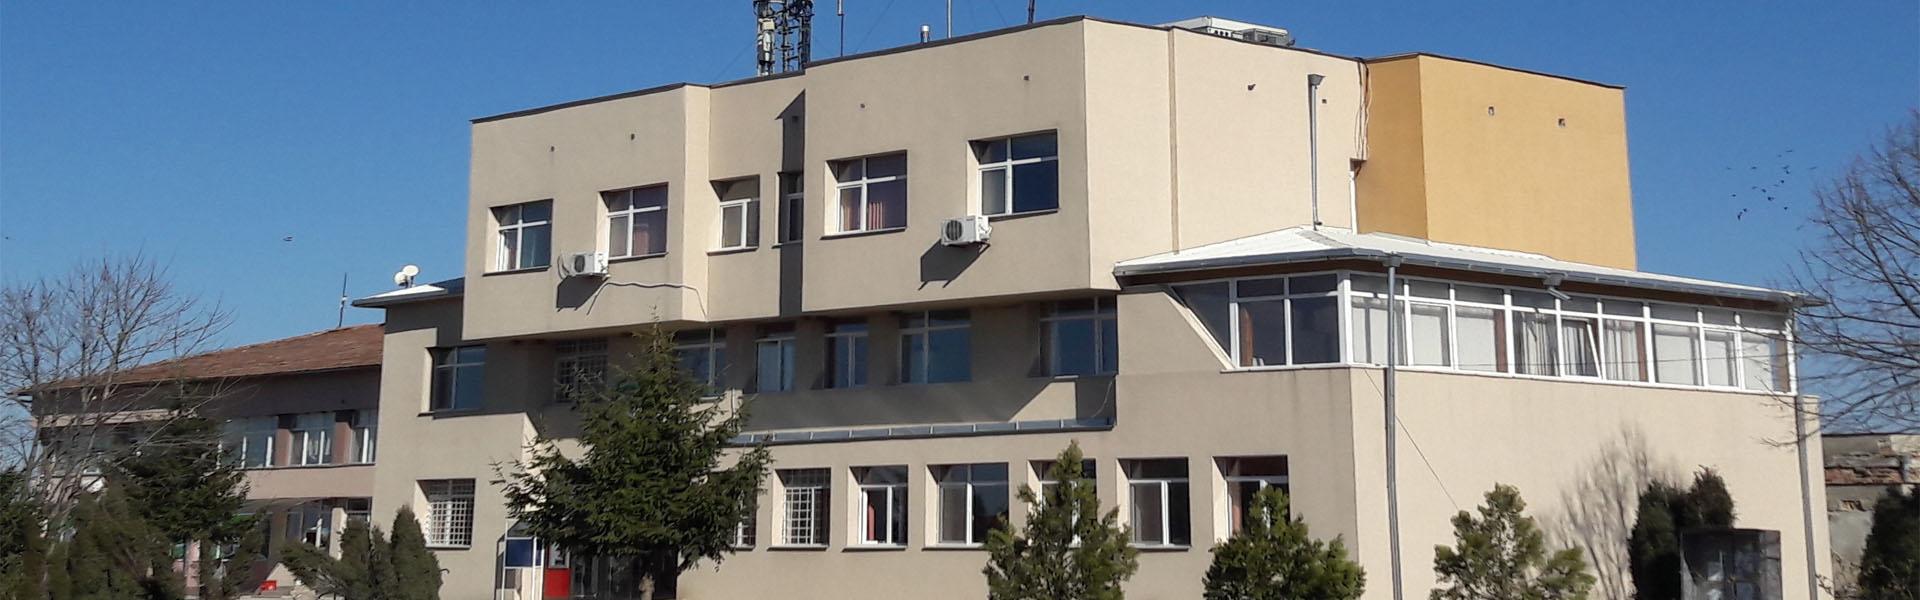 Община Самуил